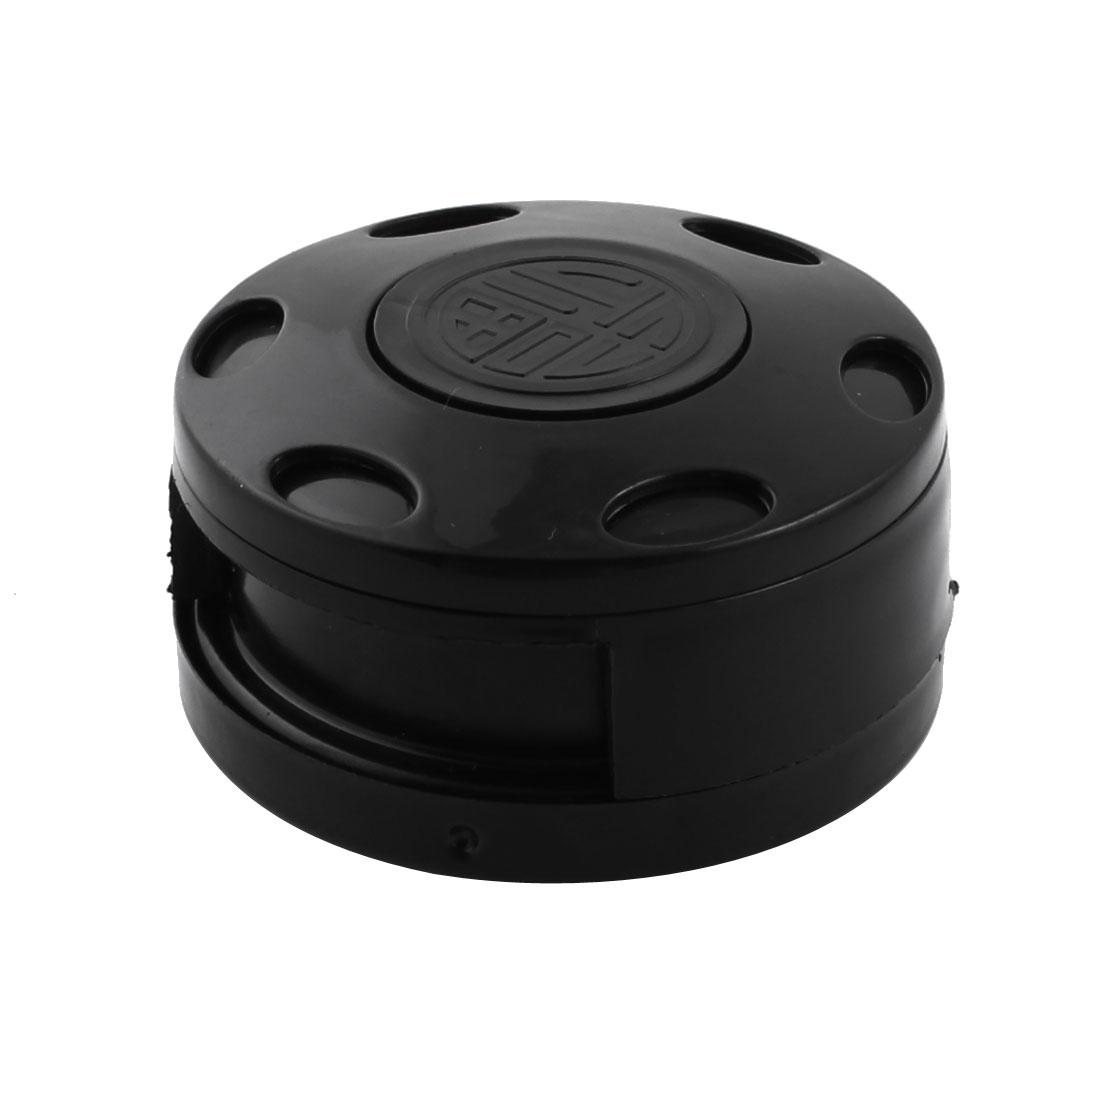 Portable Moxa Stick Case Burner Moxibustion Tank Acupuncture Box